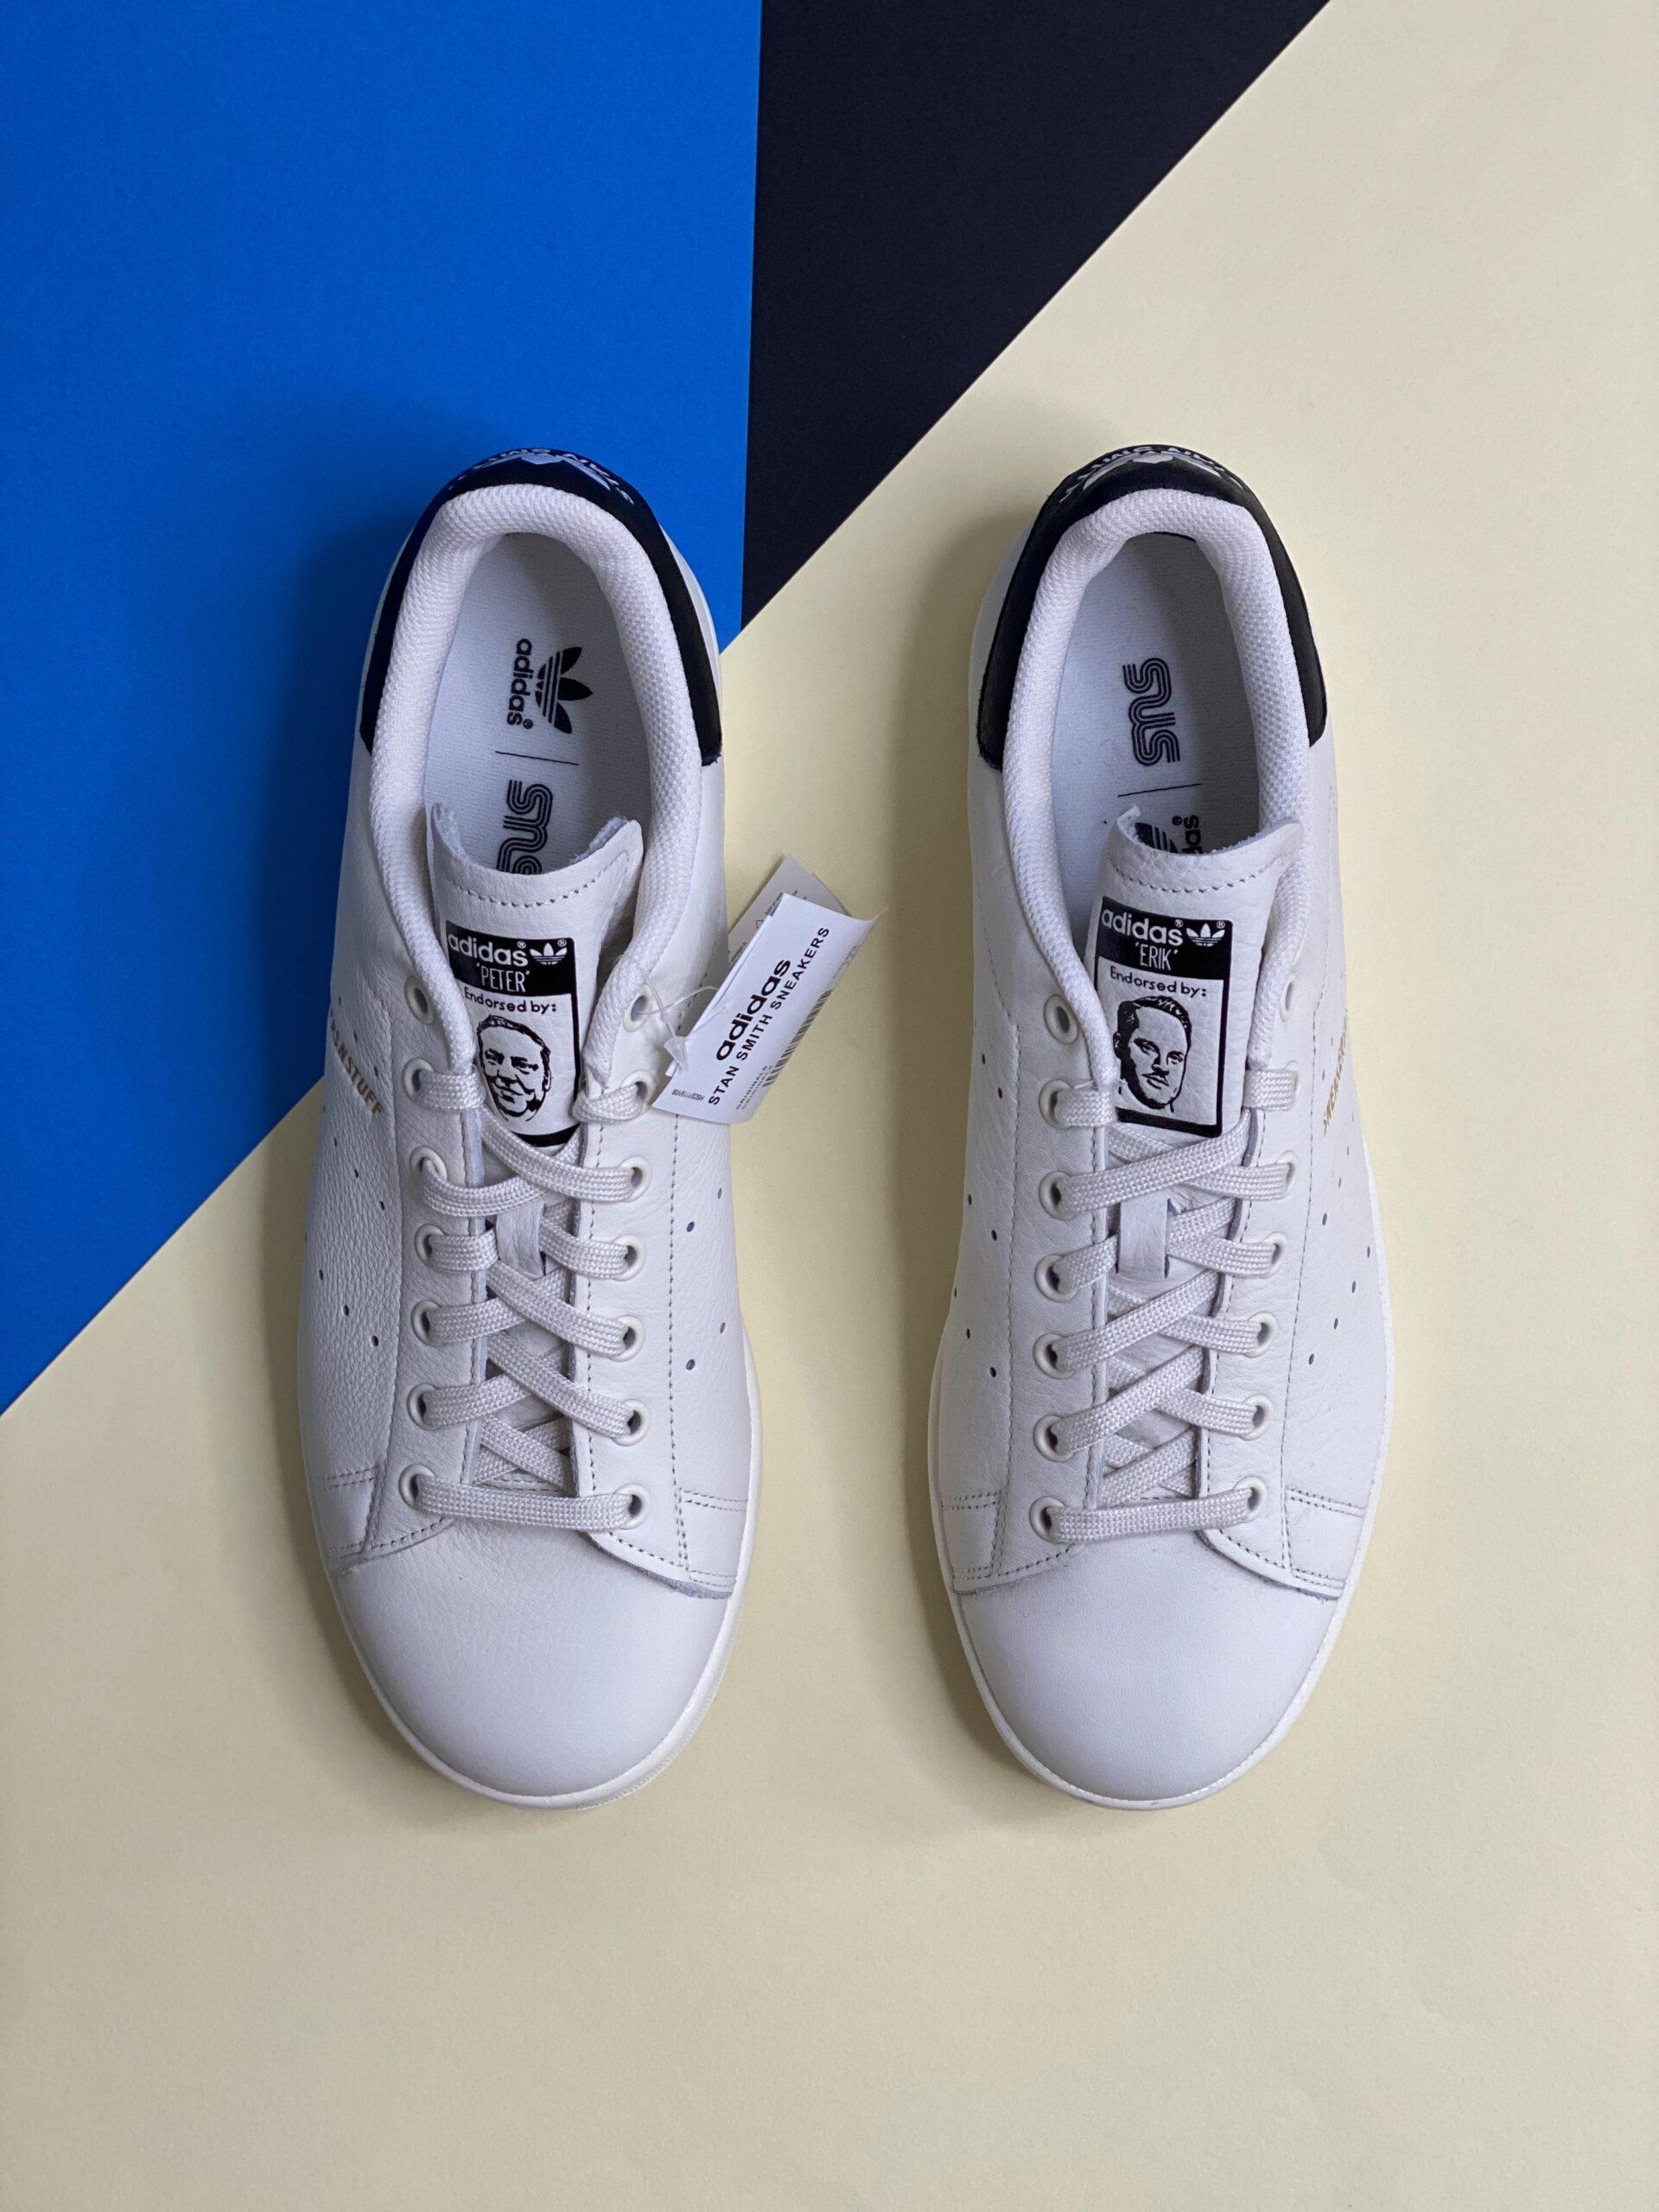 Adidas x Sneakersnstuff